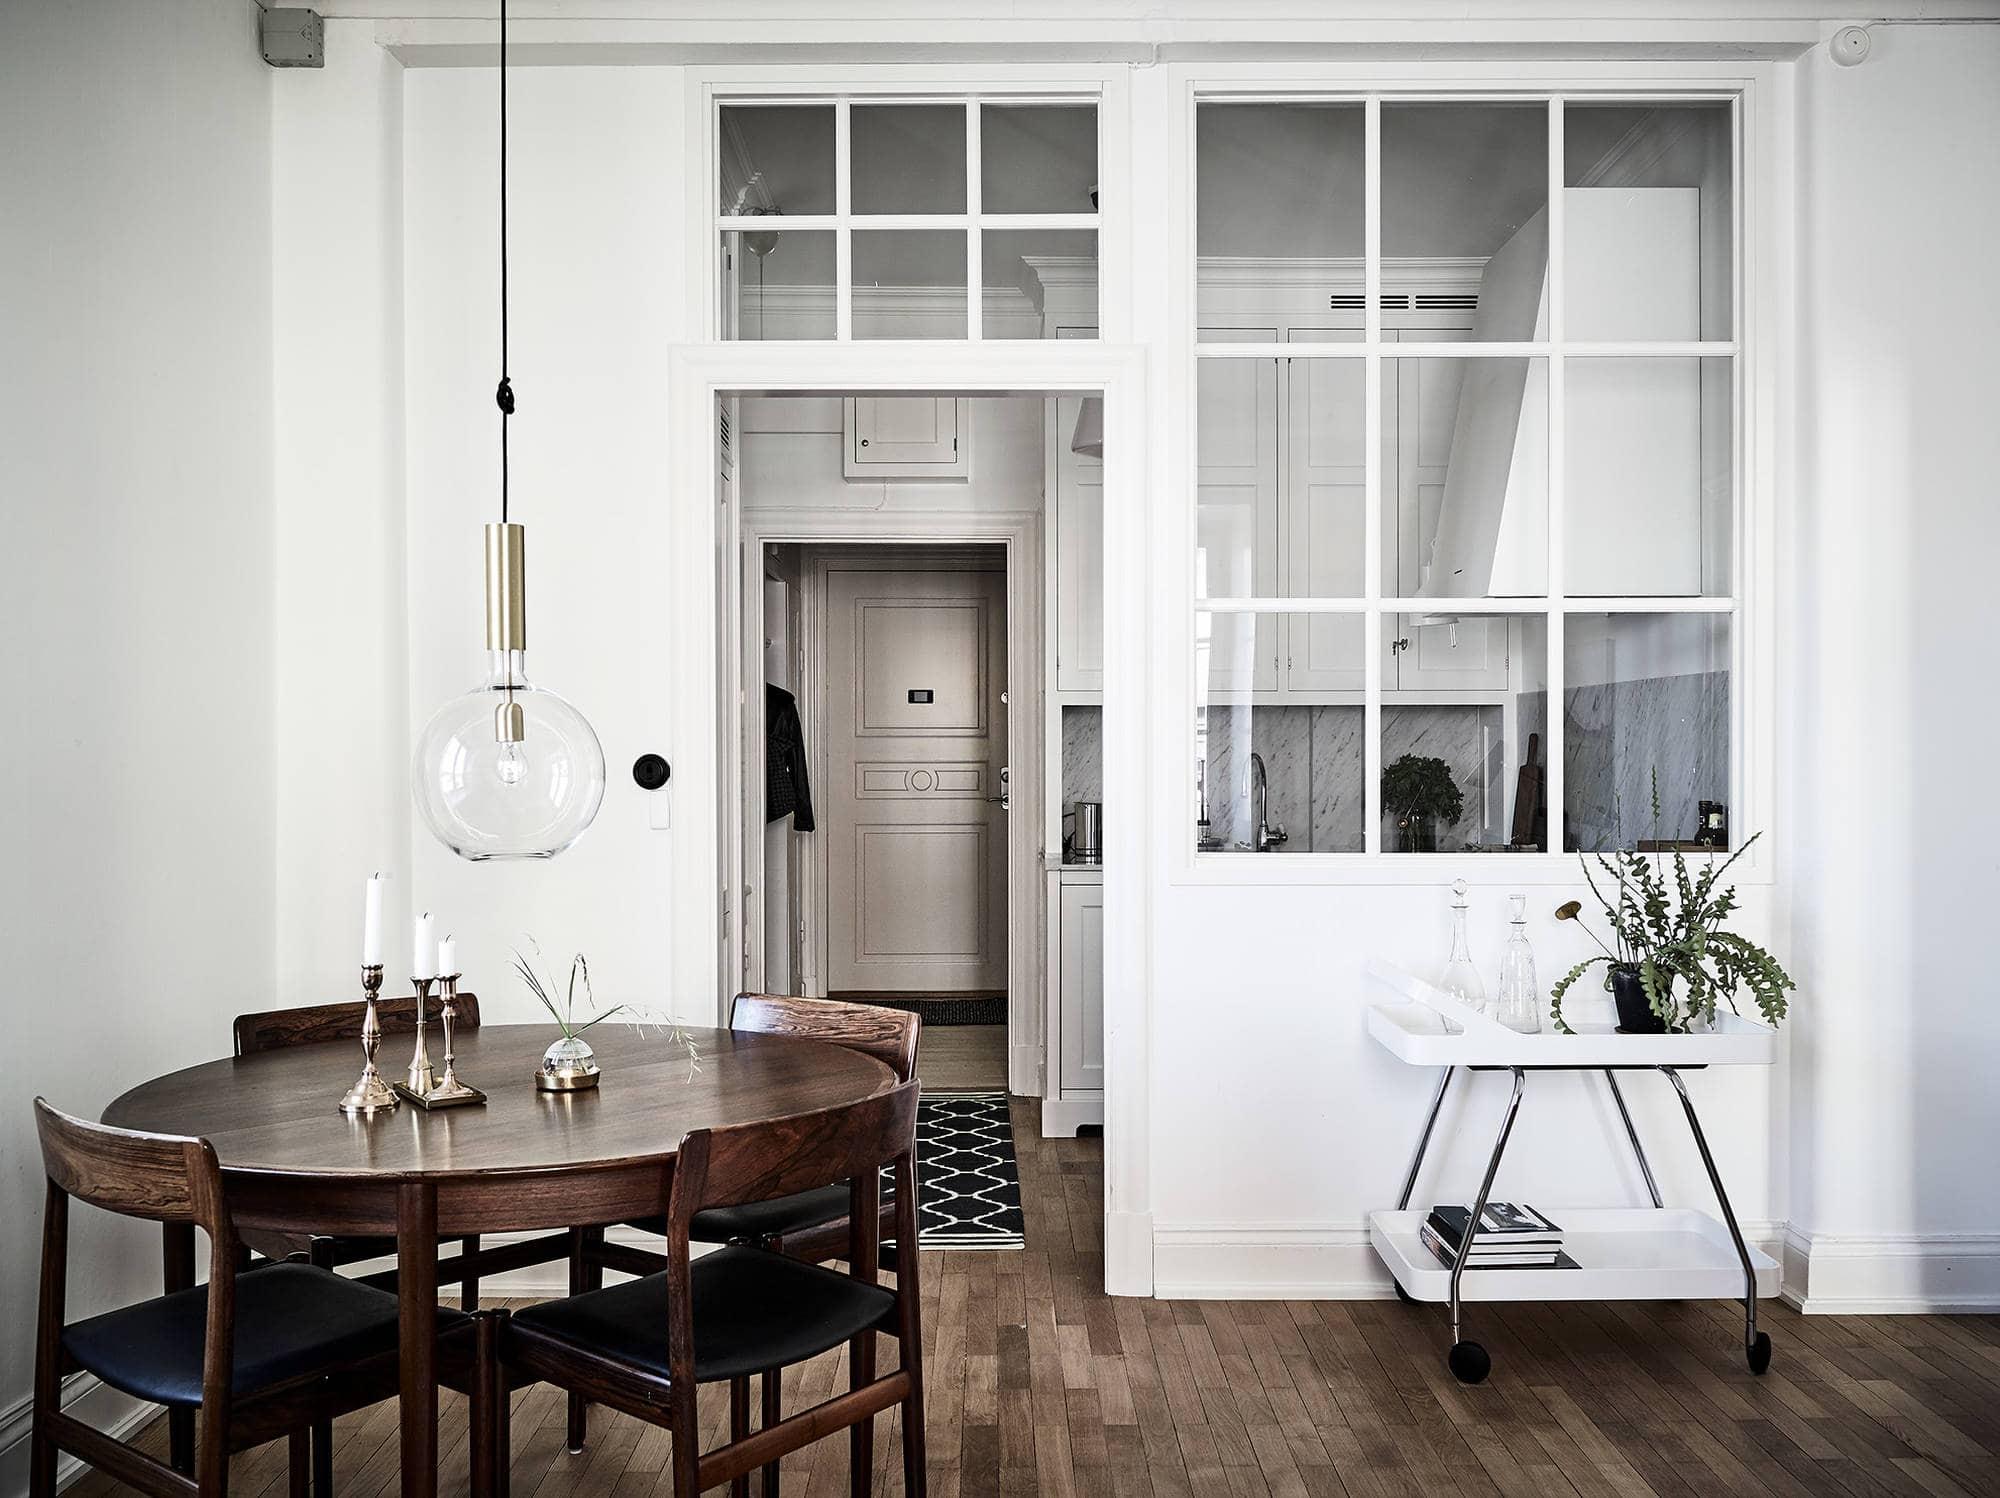 Cozy kitchen and dining area   COCO LAPINE DESIGN   Bloglovin\'